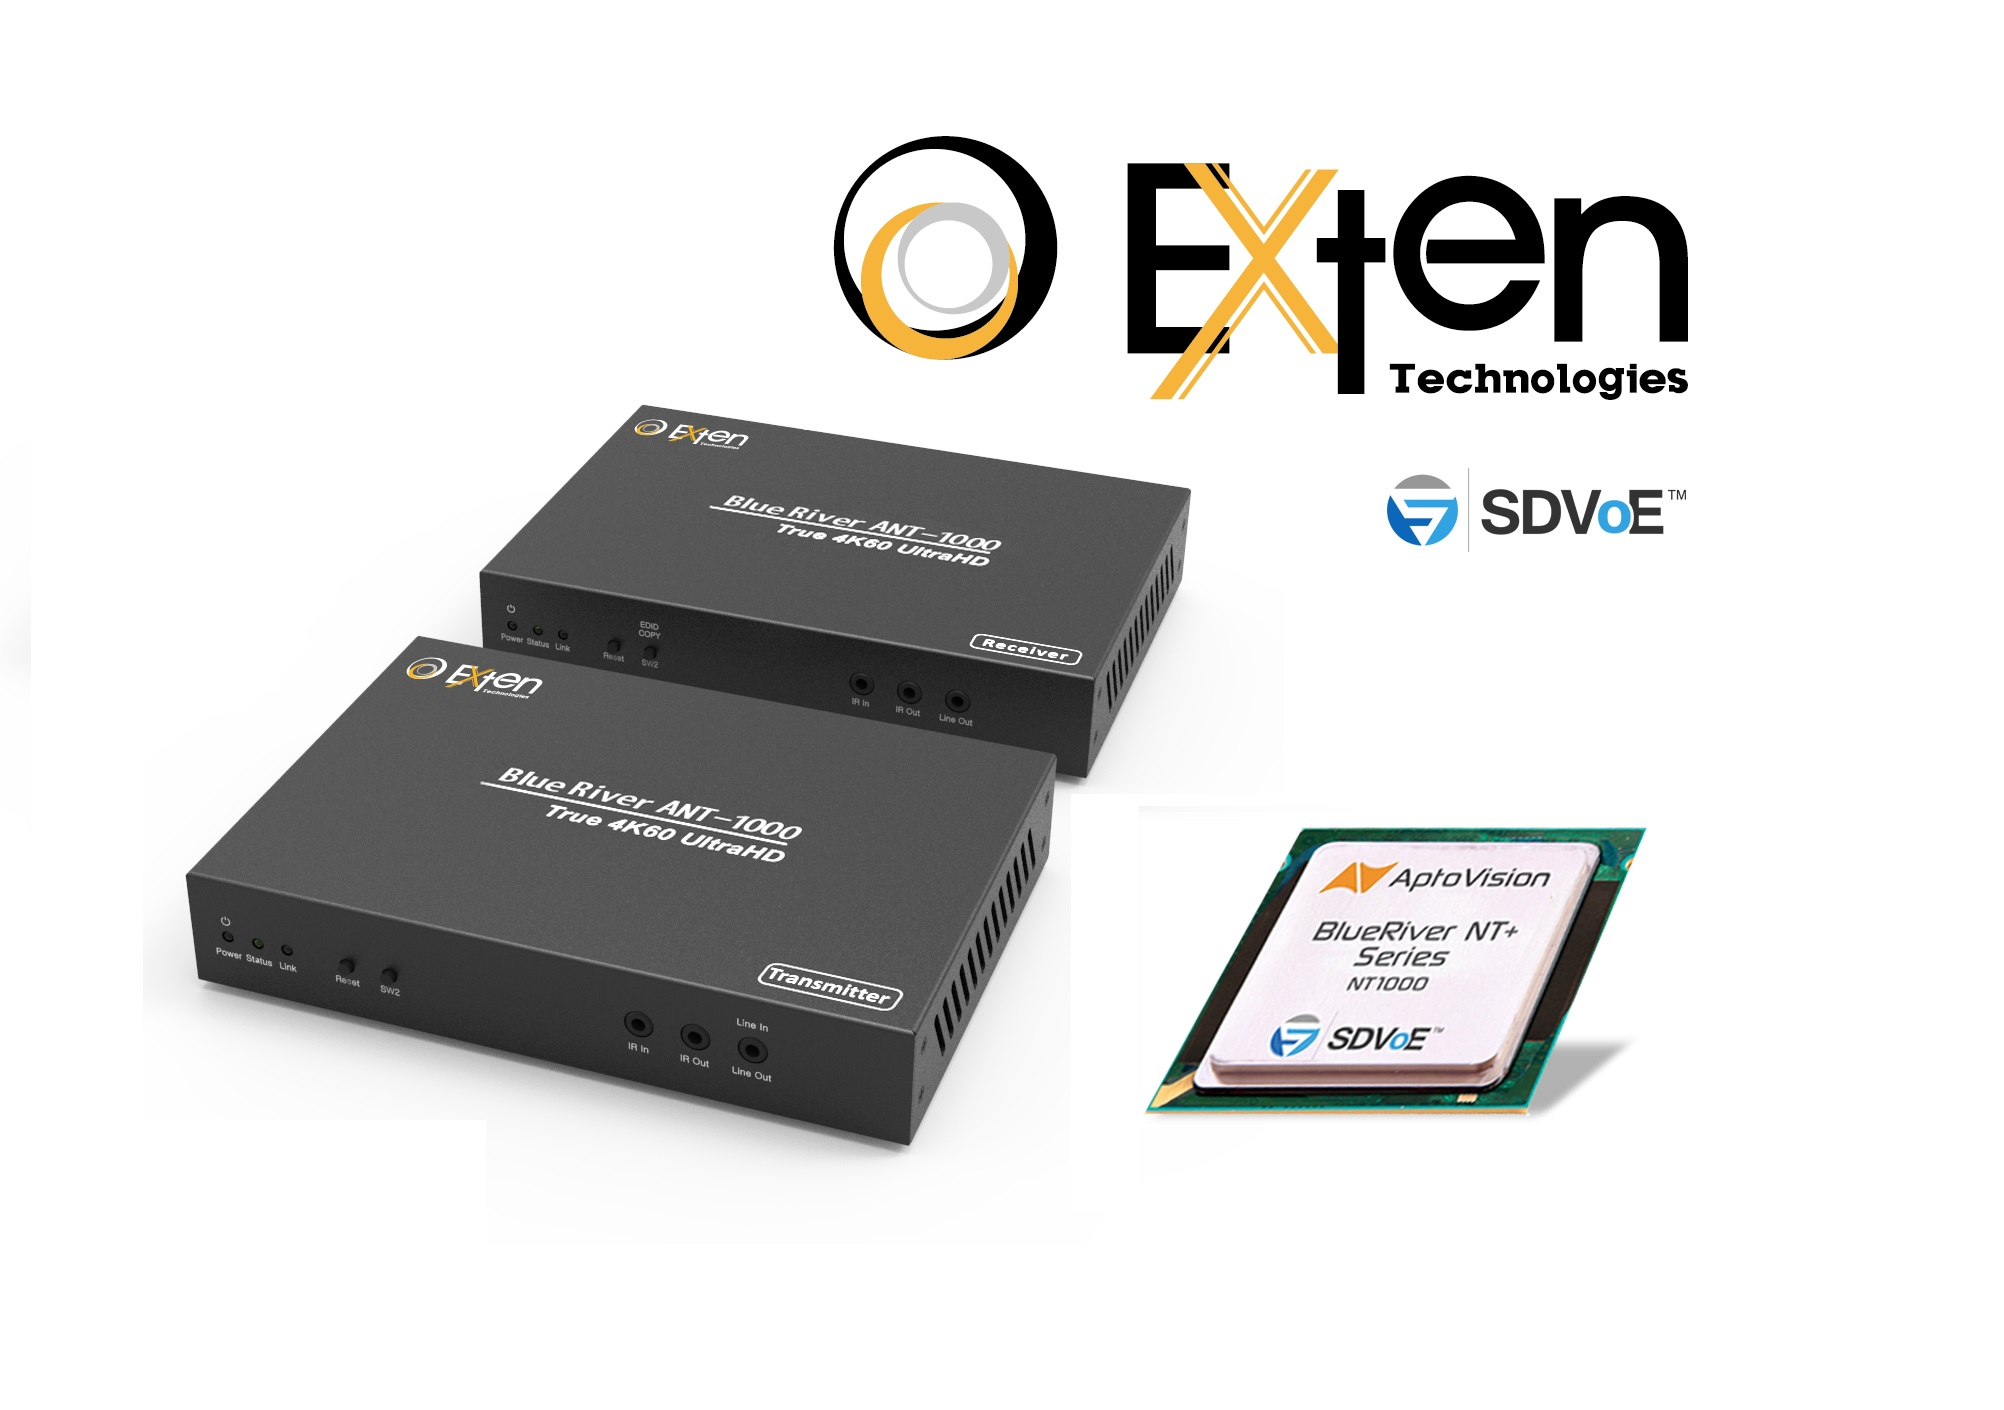 Exten 4K分布式矩阵网络发射器/接收器